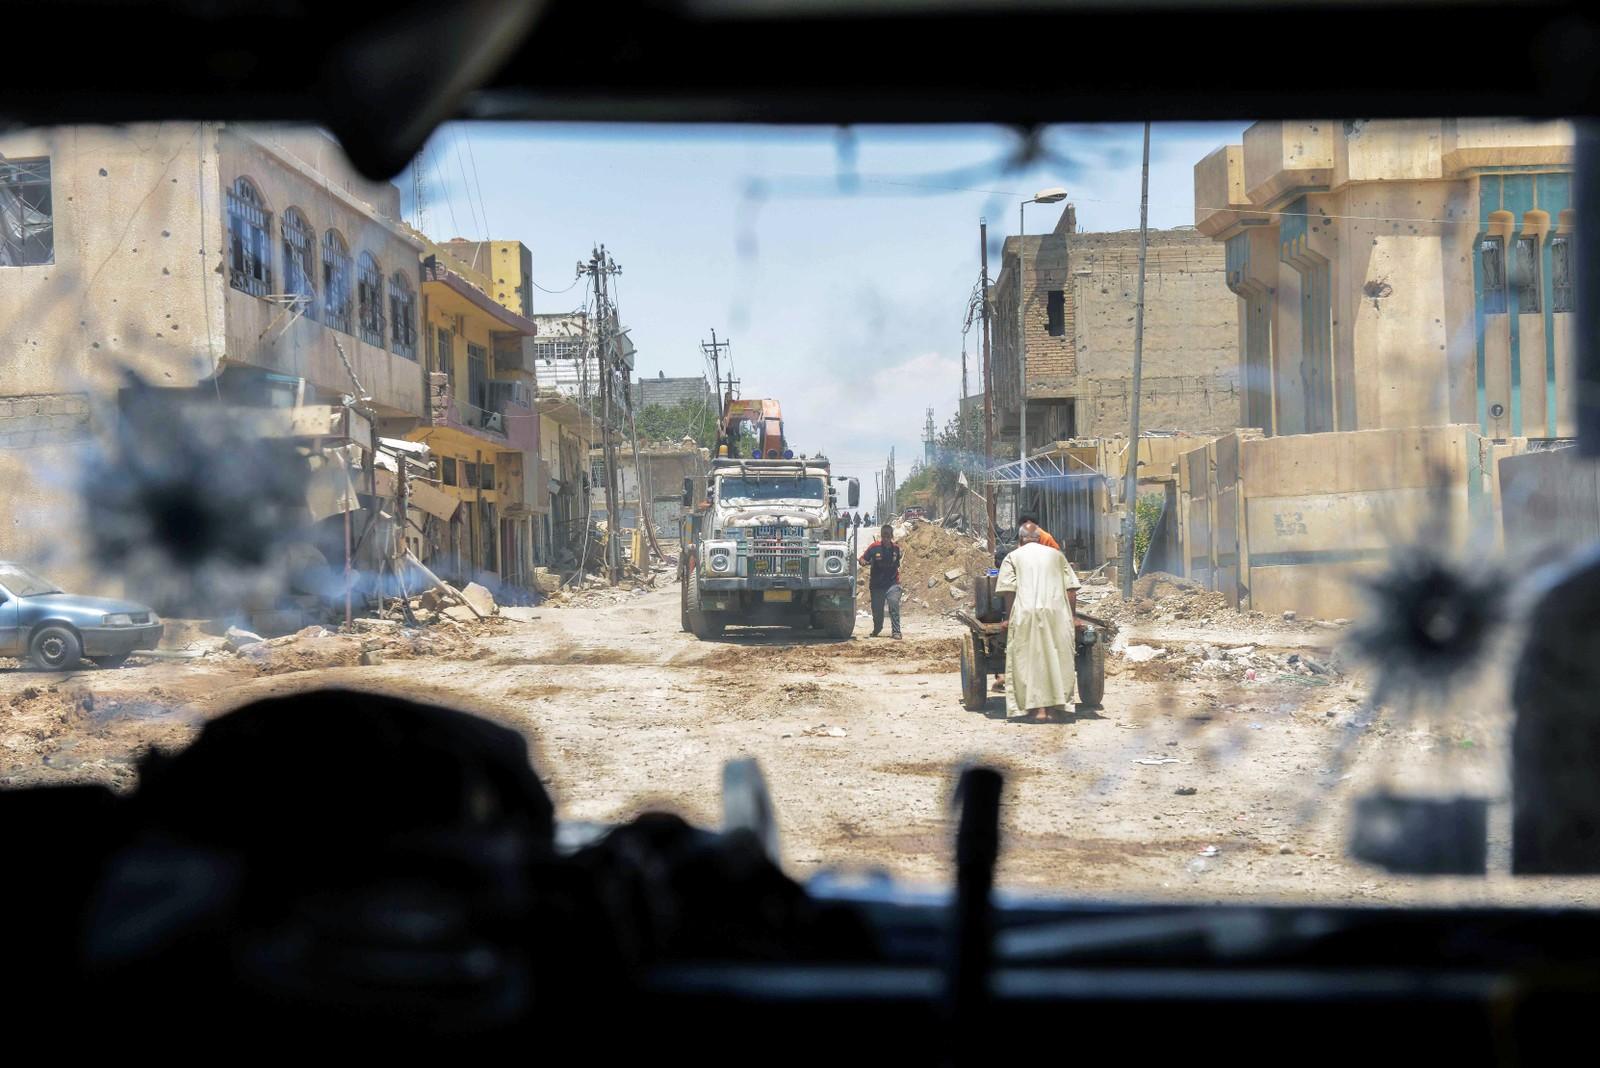 Irakiske styrker rykker fram i gamlebyen i Mosul.